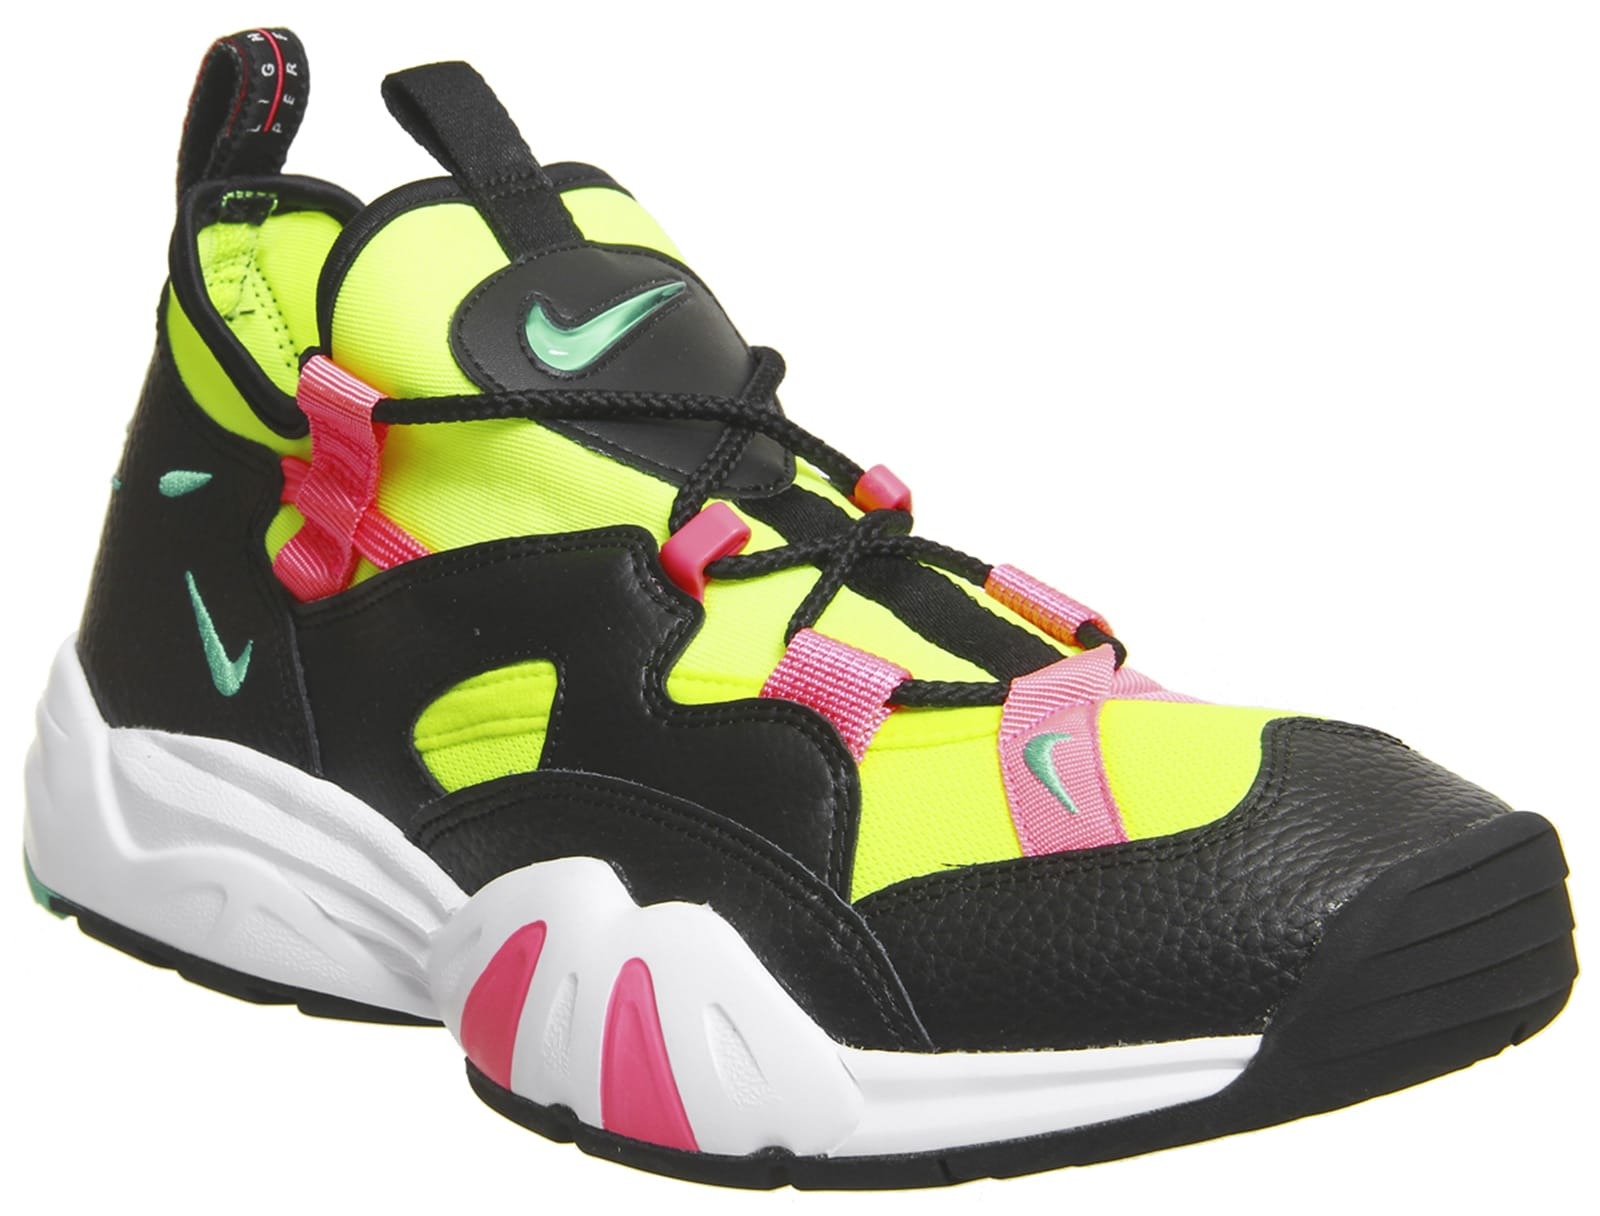 Nike Air Scream LWP 'Black/Menta/Racer Pink' (Front)